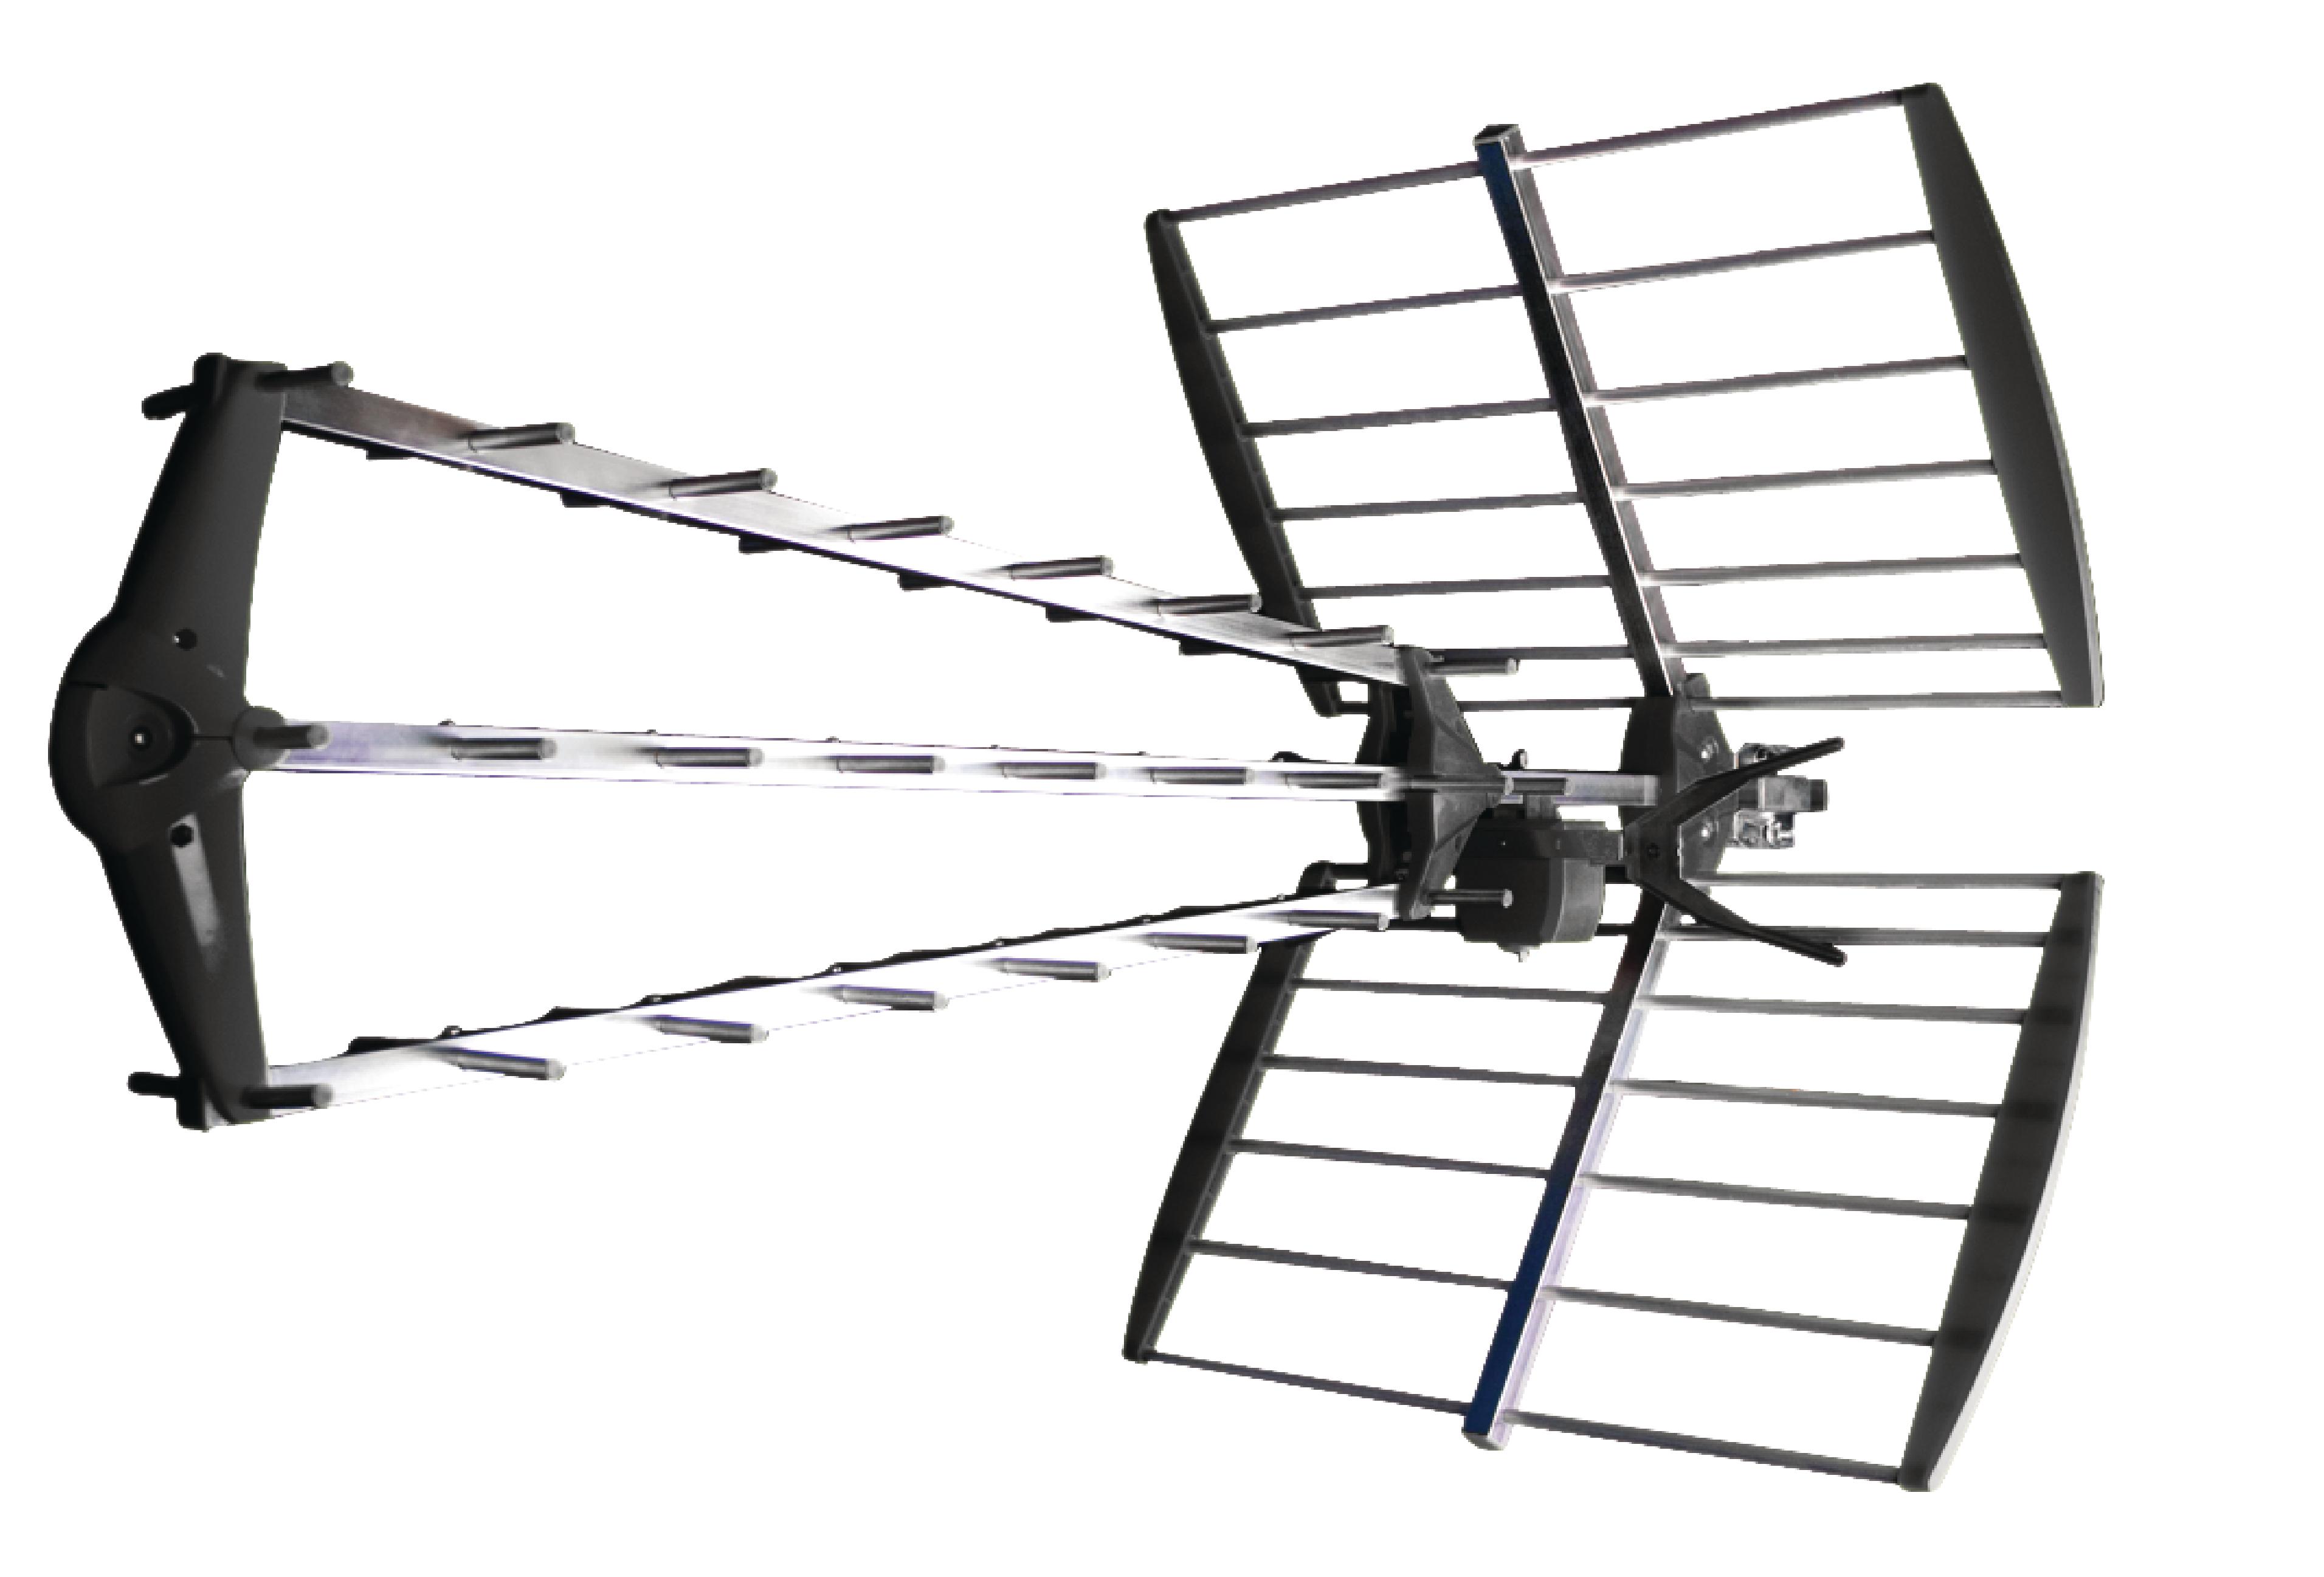 ant-uhf52l-kn - k u00f6nig  t2 outdoor antenna 15 5 db